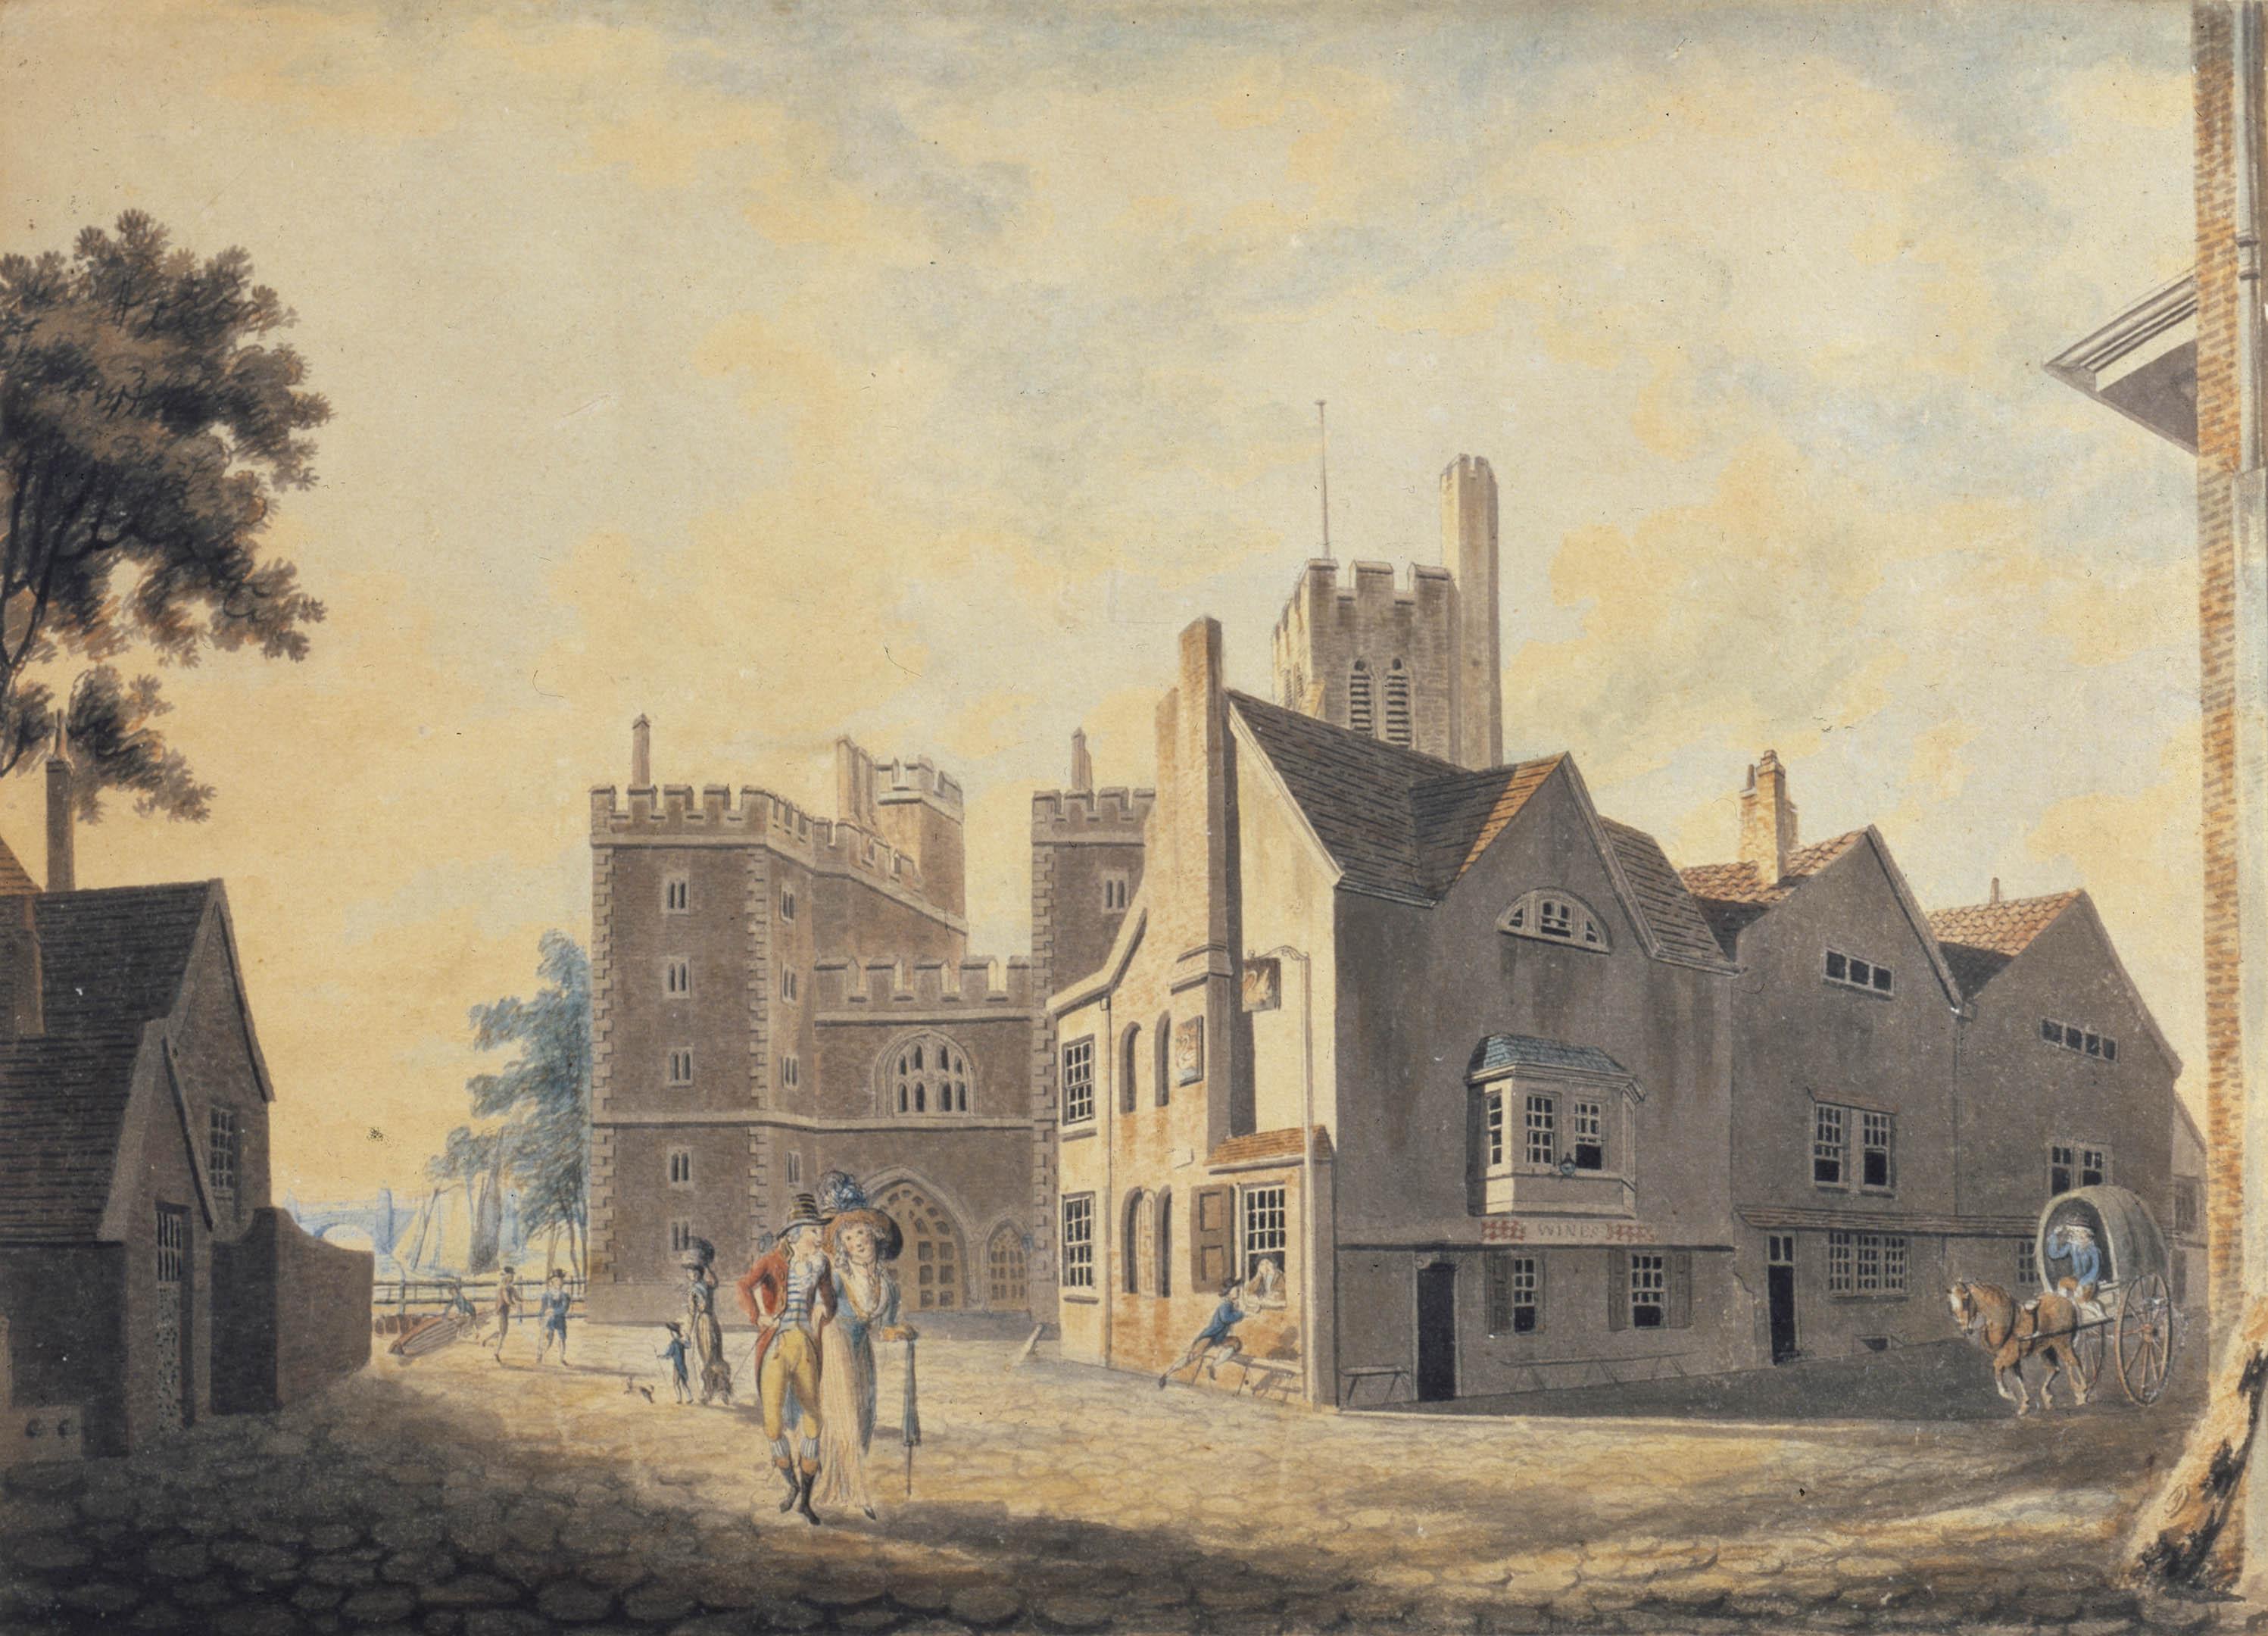 J  M  W  Turner: British Romantic landscape painter, water